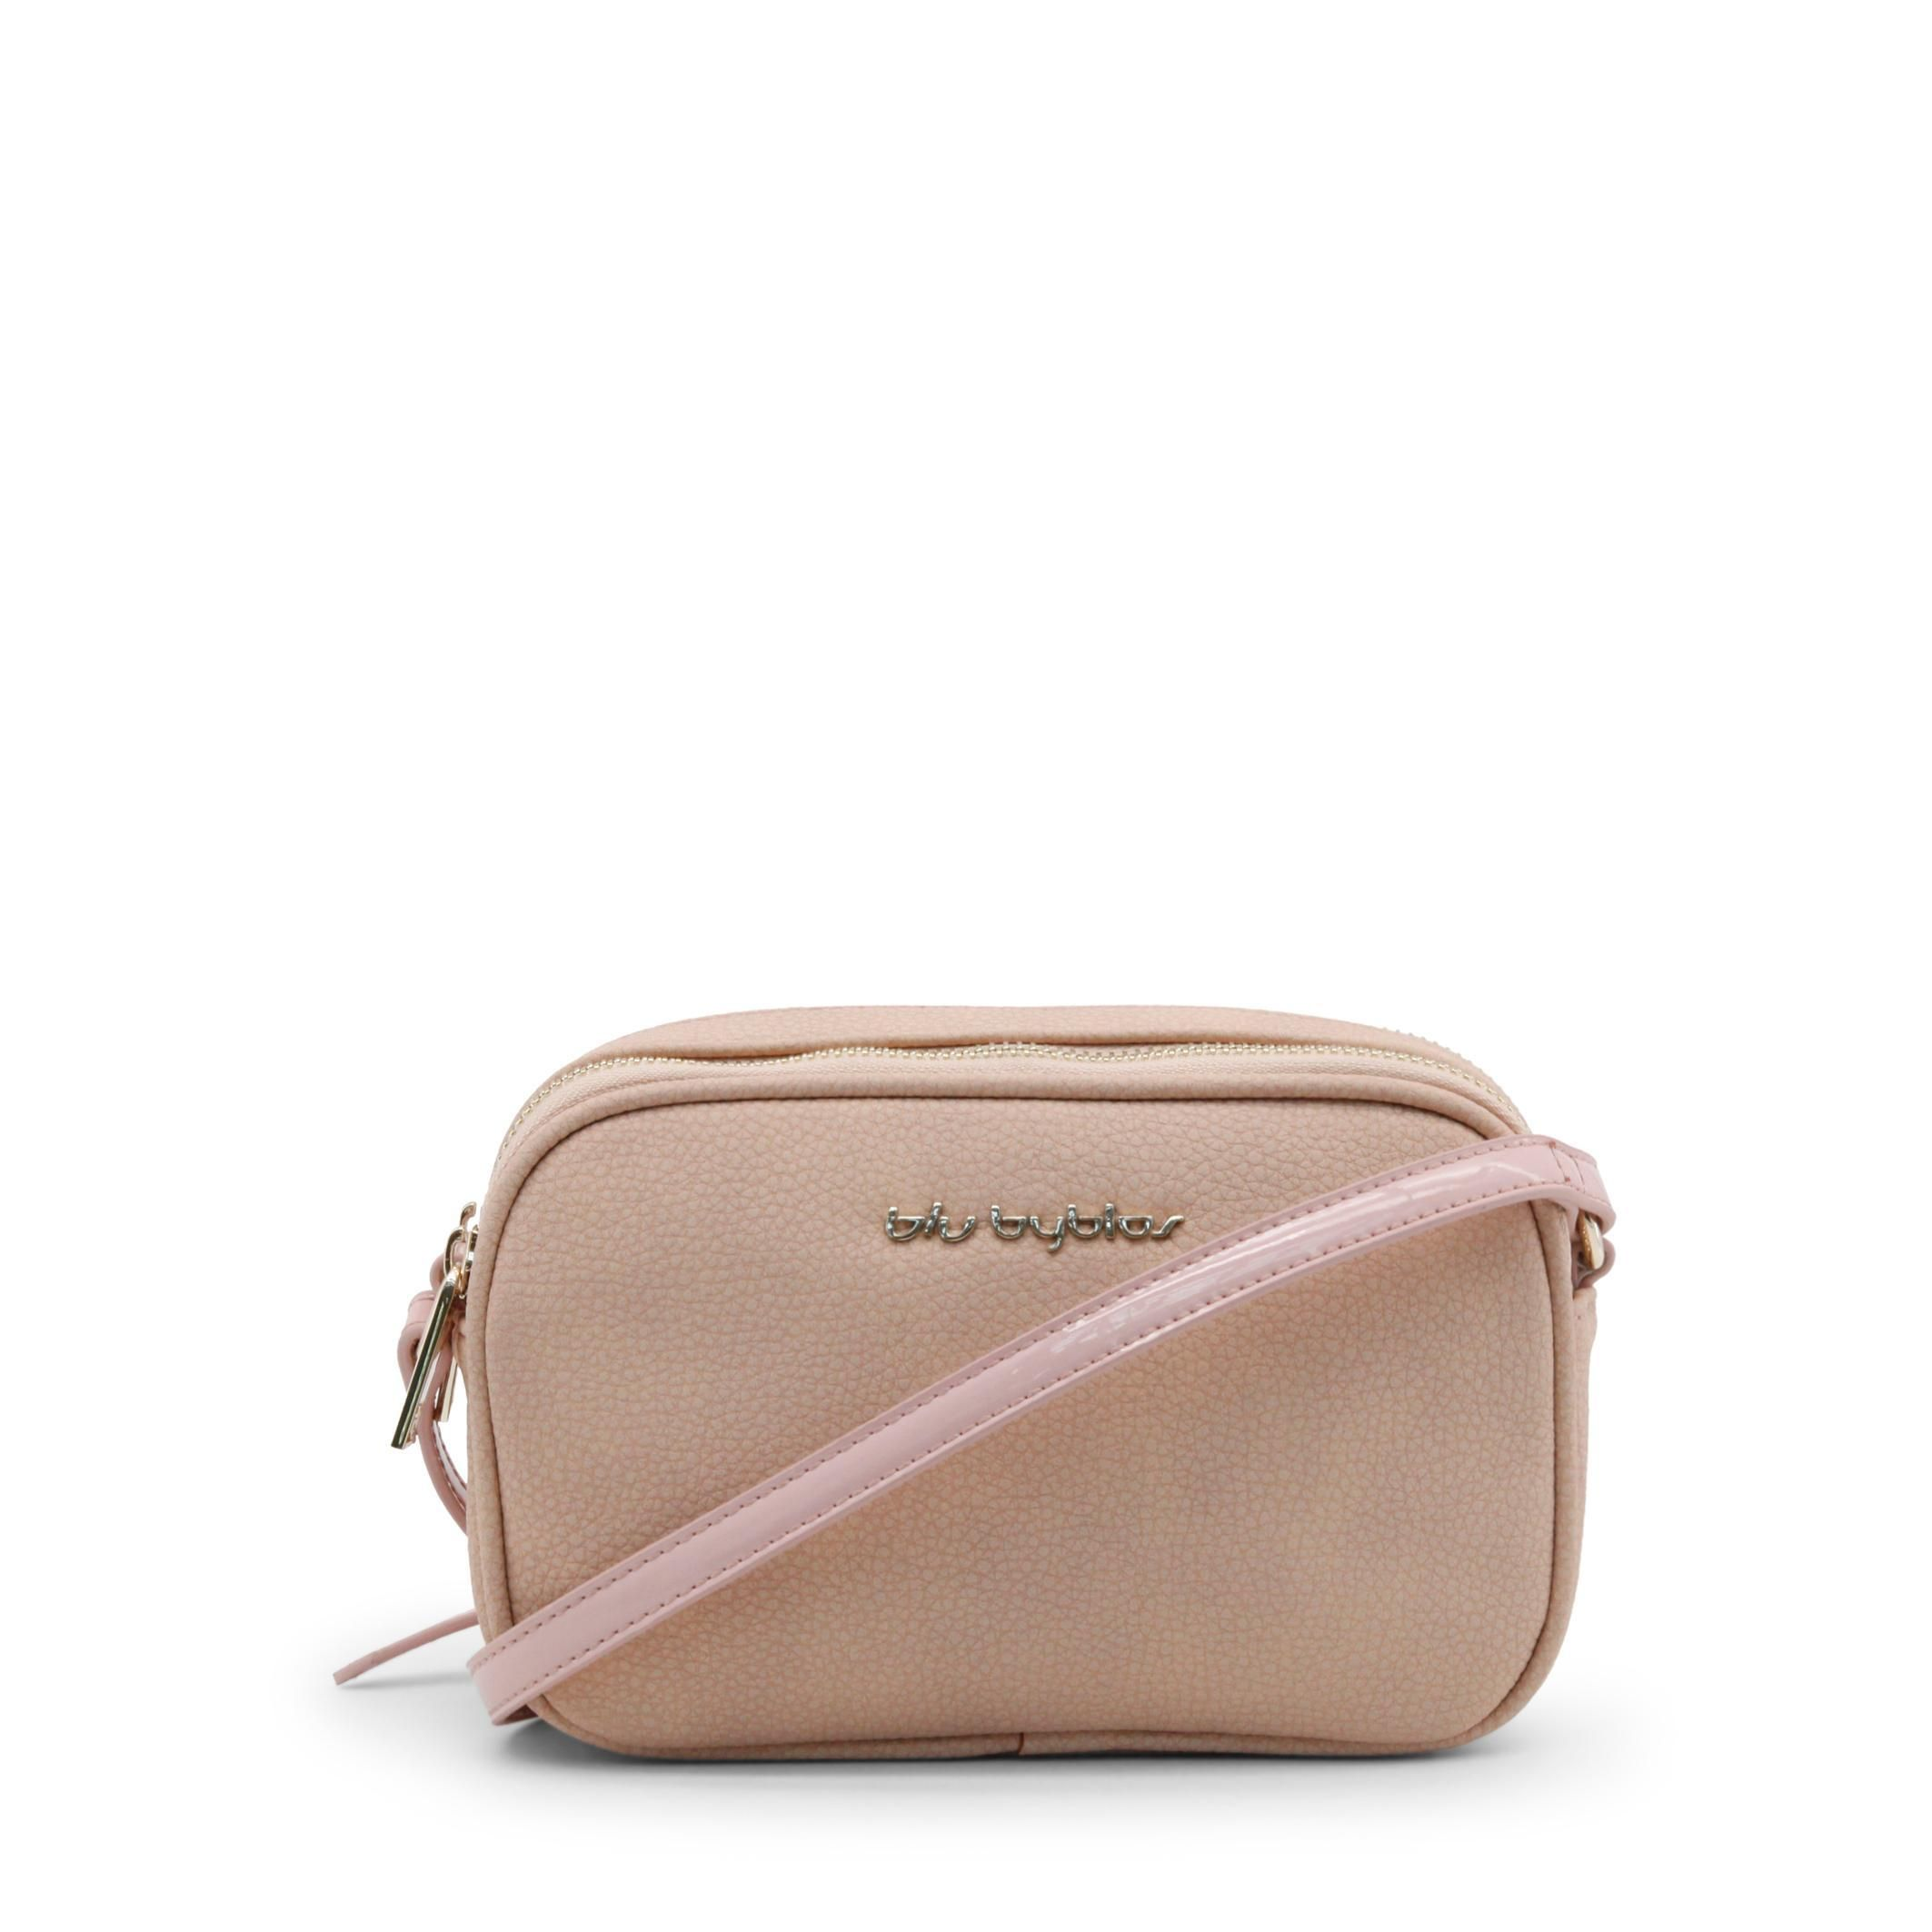 half off 56086 60c73 Blu Byblos - TAPIR_680457   Products   Pink crossbody bag ...